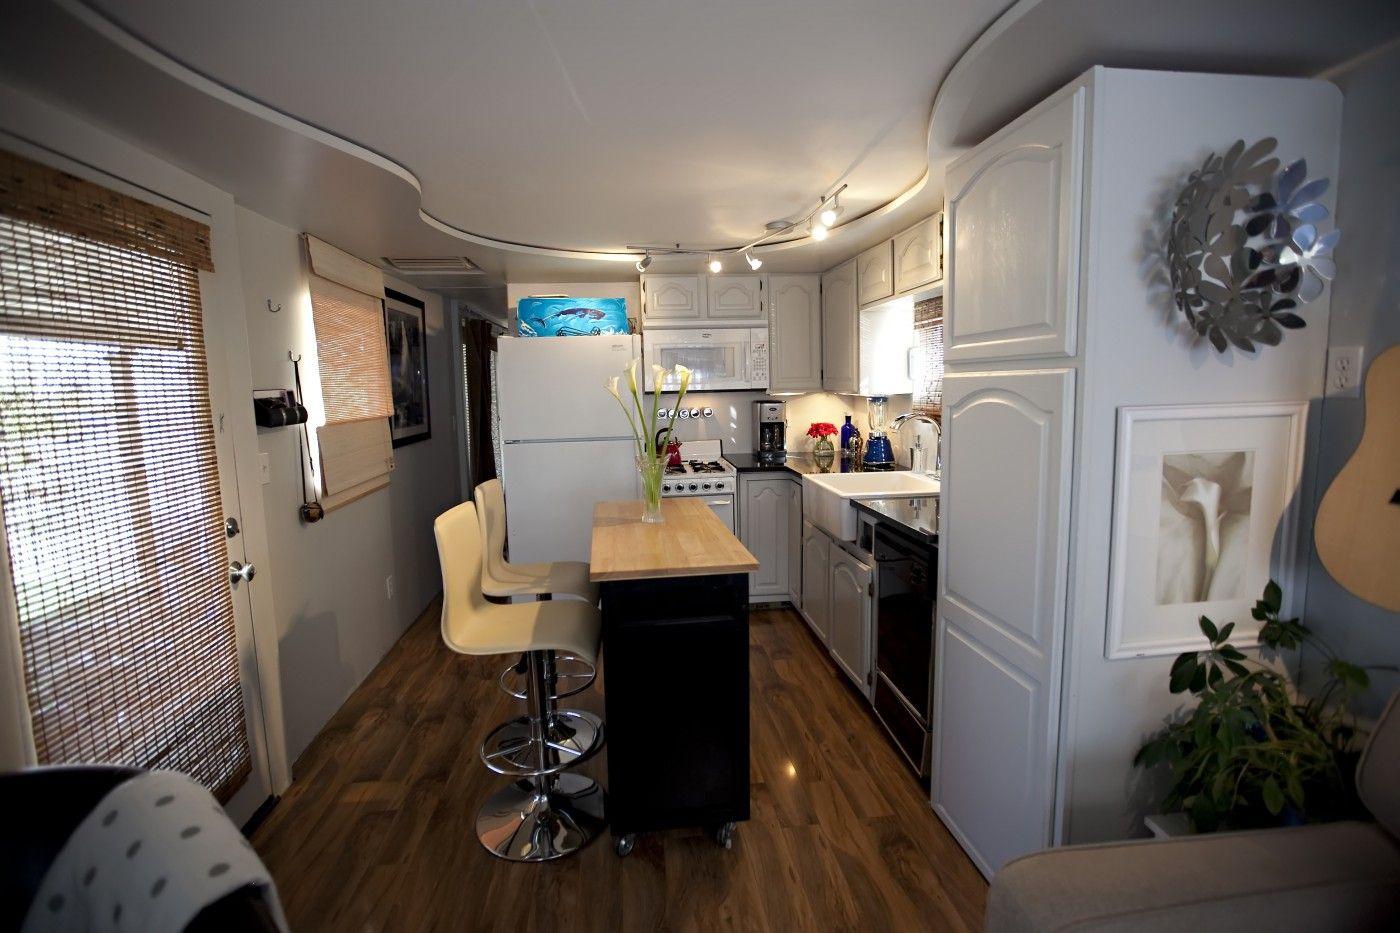 Total Trailer Remodel - Mobile & Manufactured Home Living | Pinterest